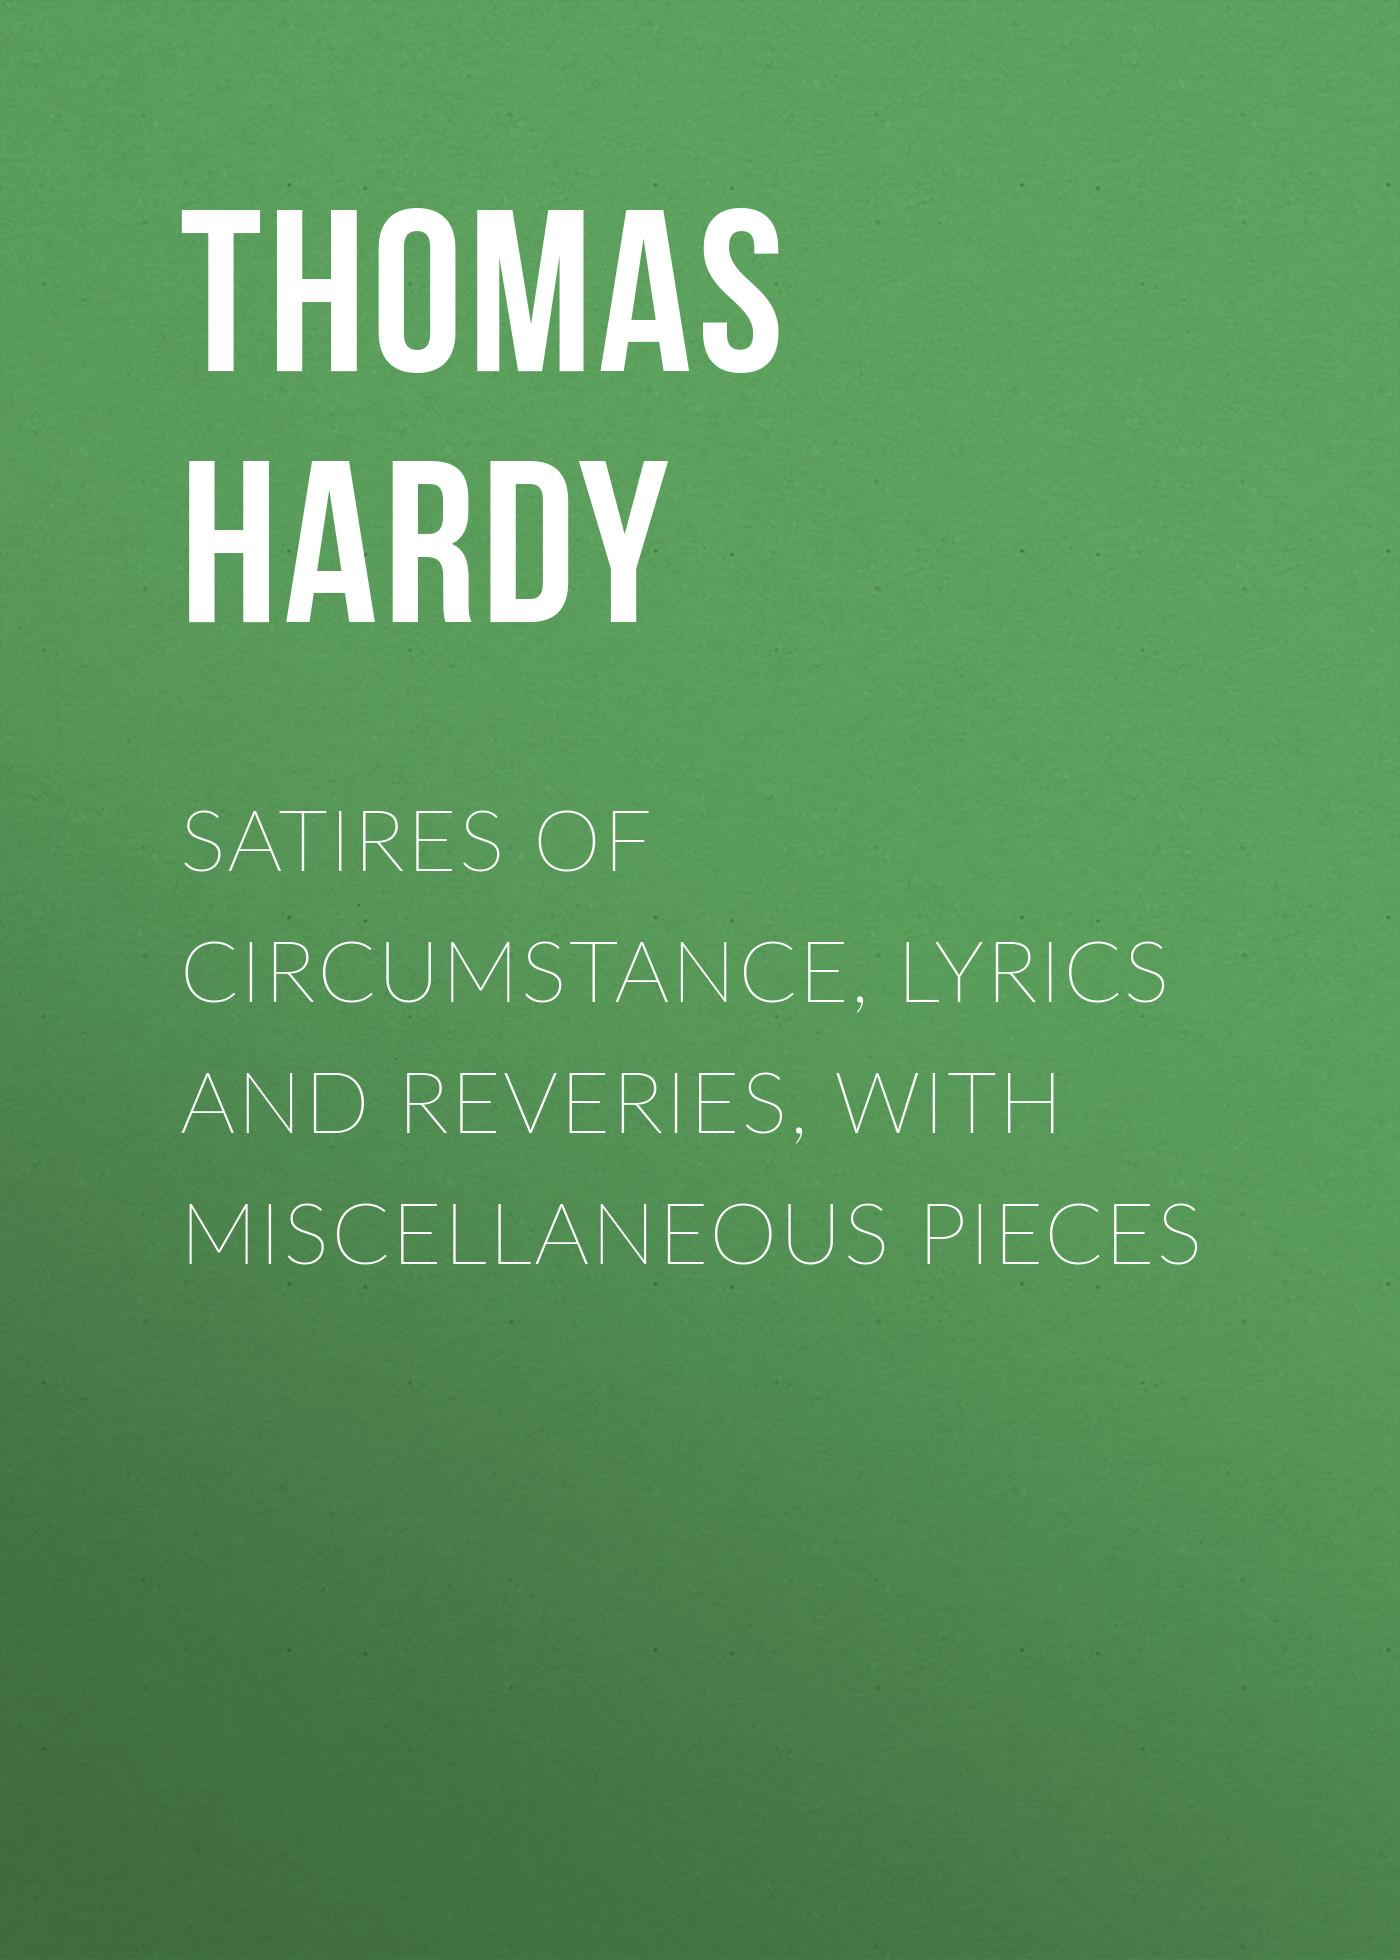 Thomas Hardy Satires of Circumstance, Lyrics and Reveries, with Miscellaneous Pieces lyrics volume 1